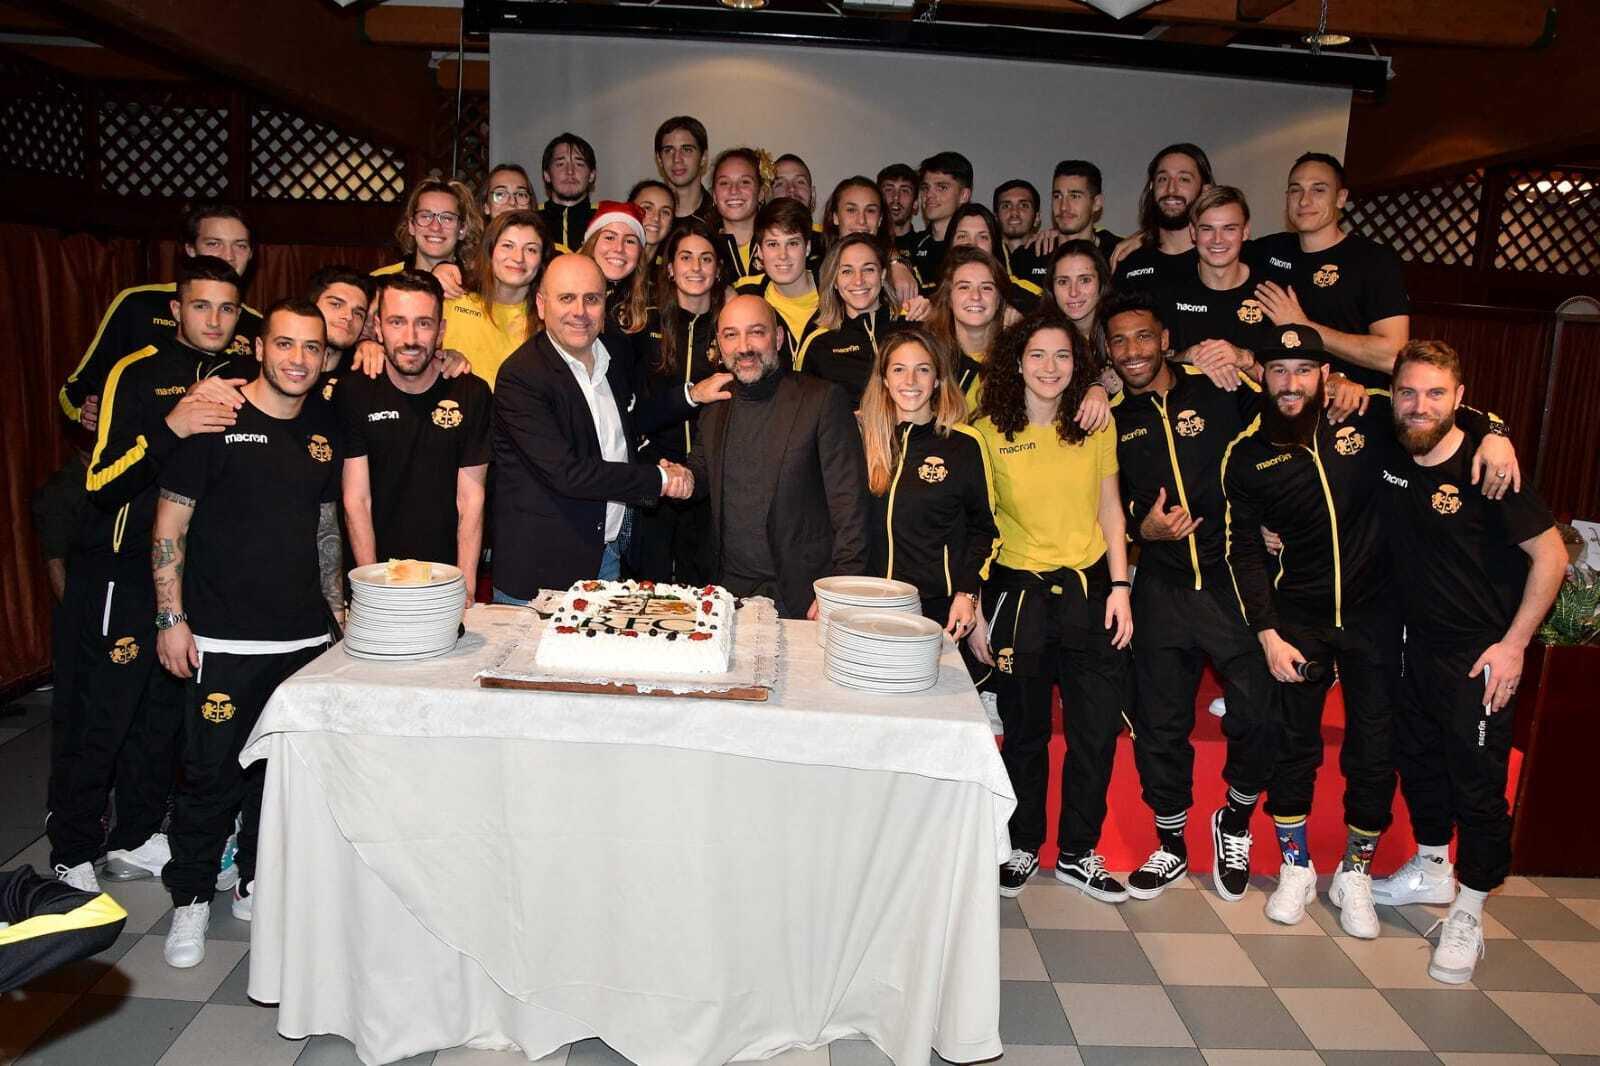 Calcio, Ravenna e Ravenna Women festeggiano insieme il Natale